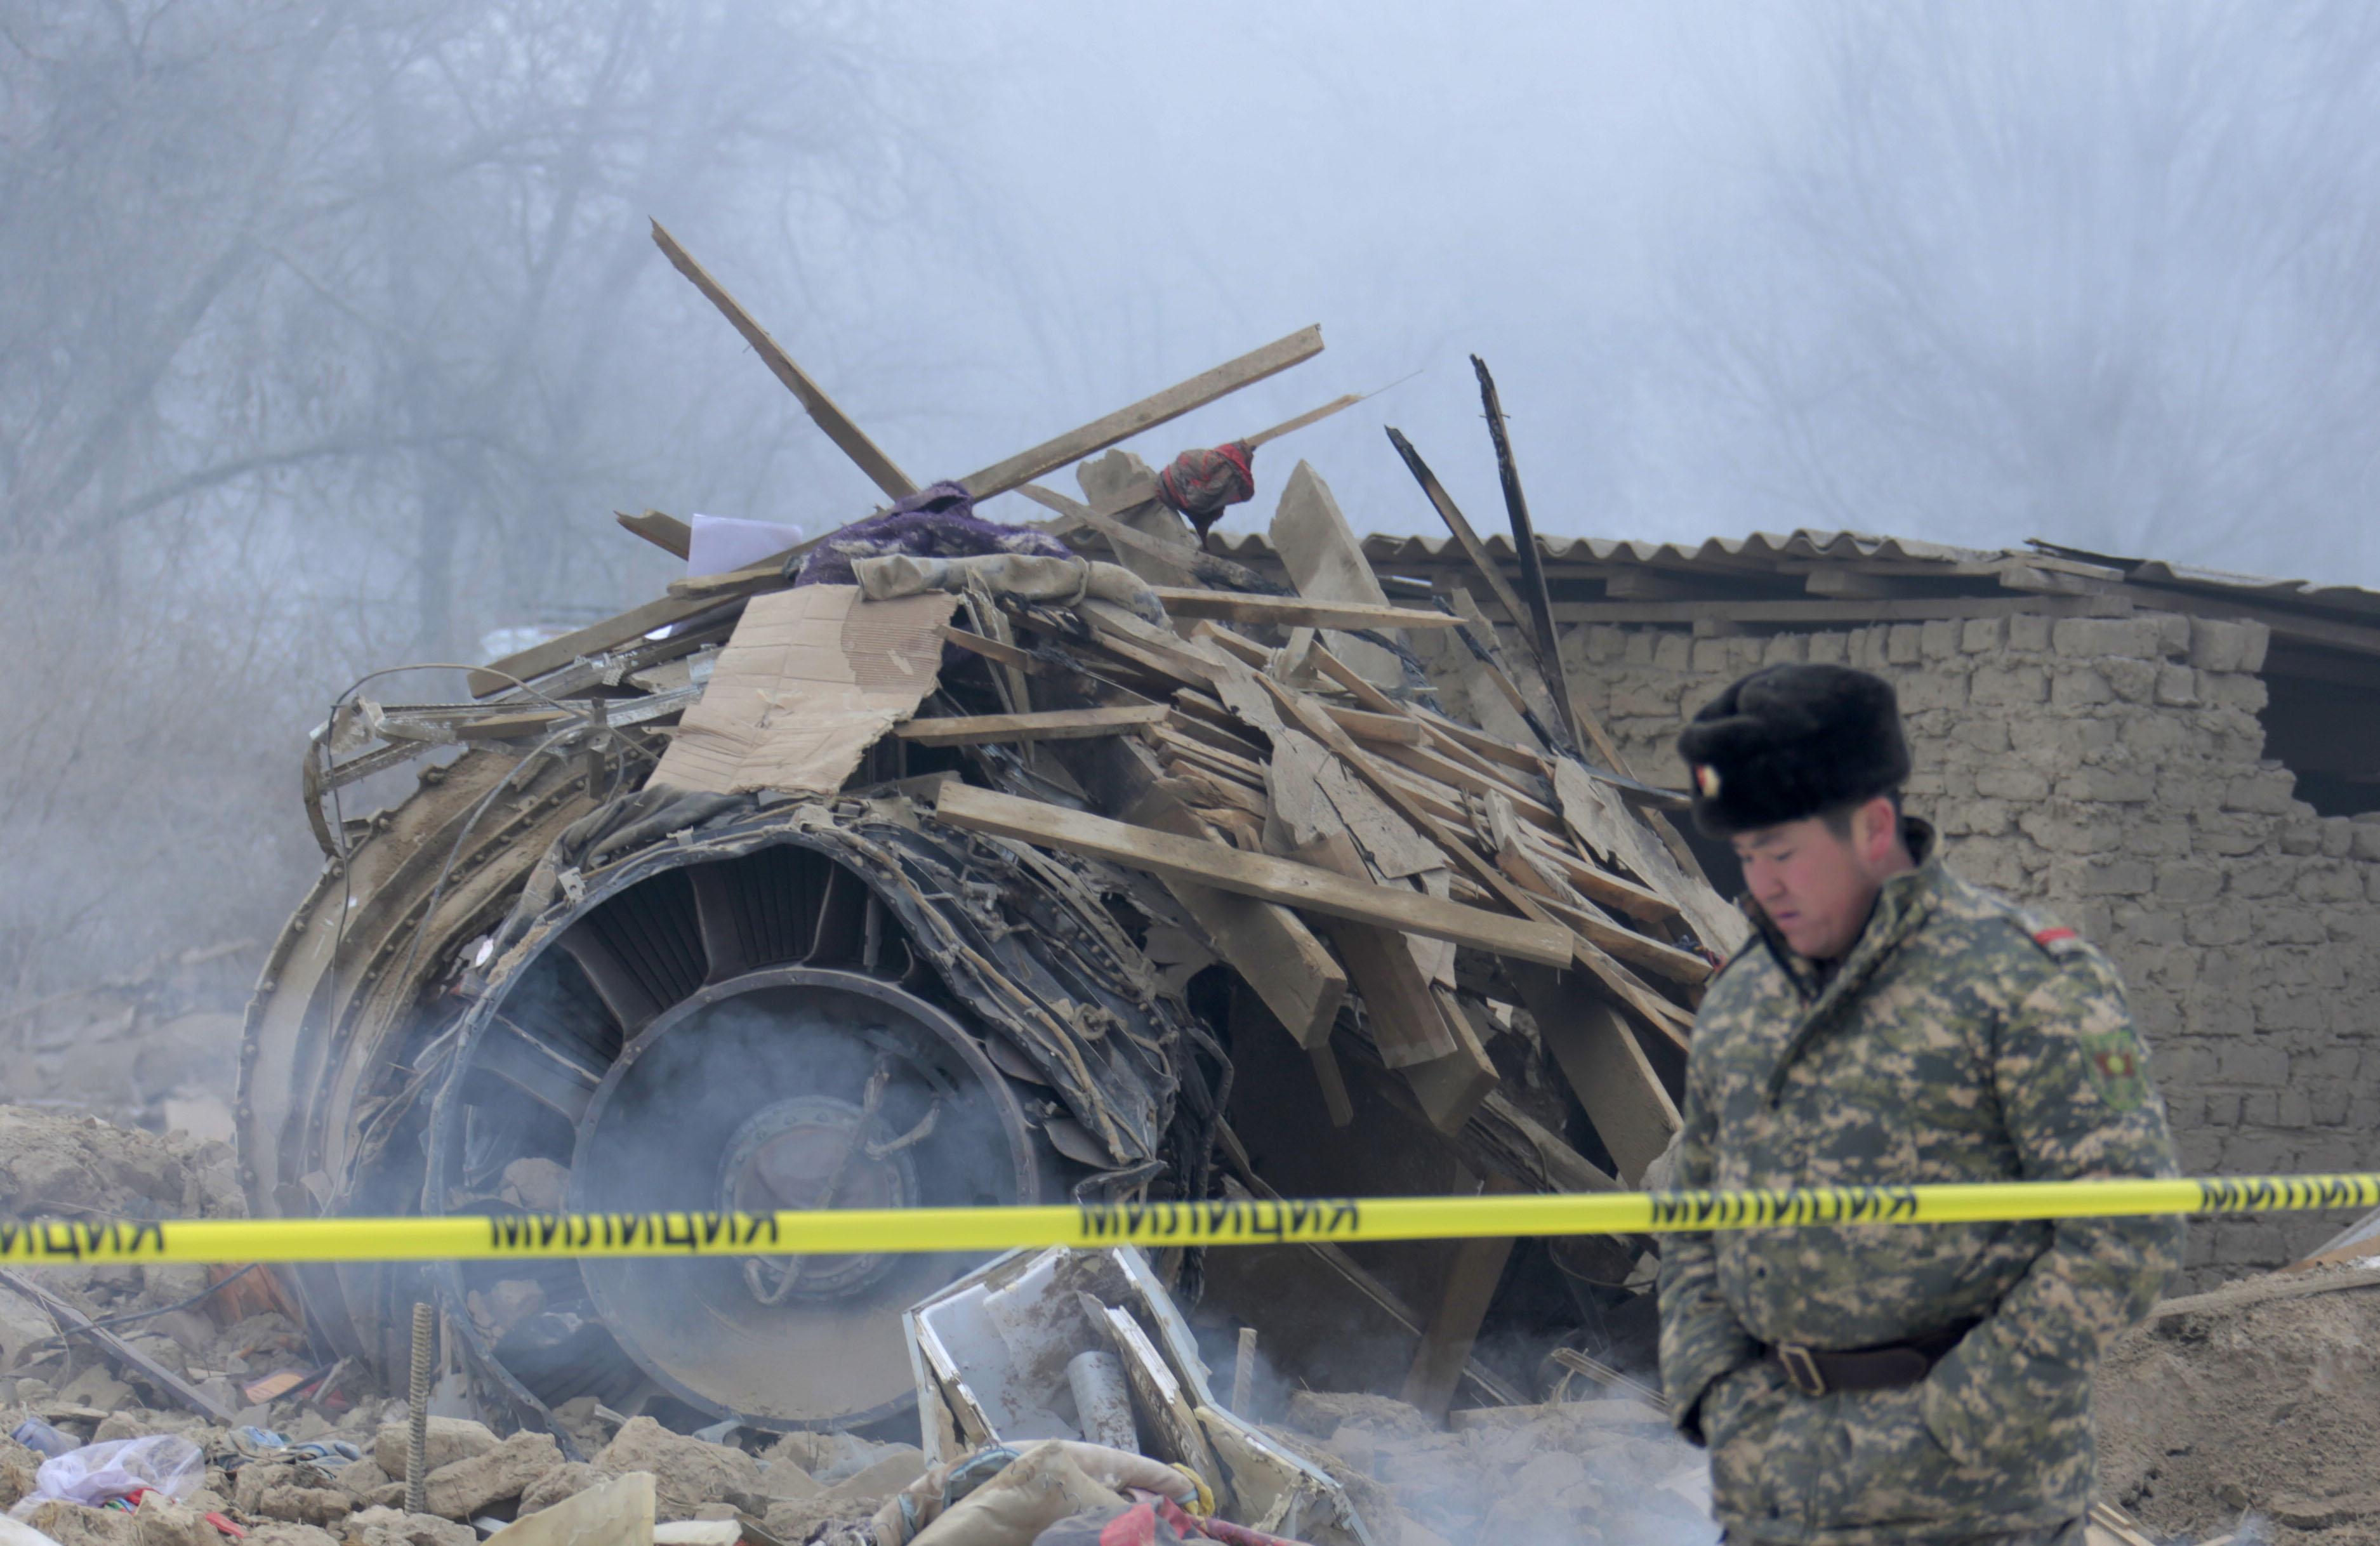 Двигатель рухнувшего самолёта. Фото: Тилек Бейшеналы уулу / Kloop.kg